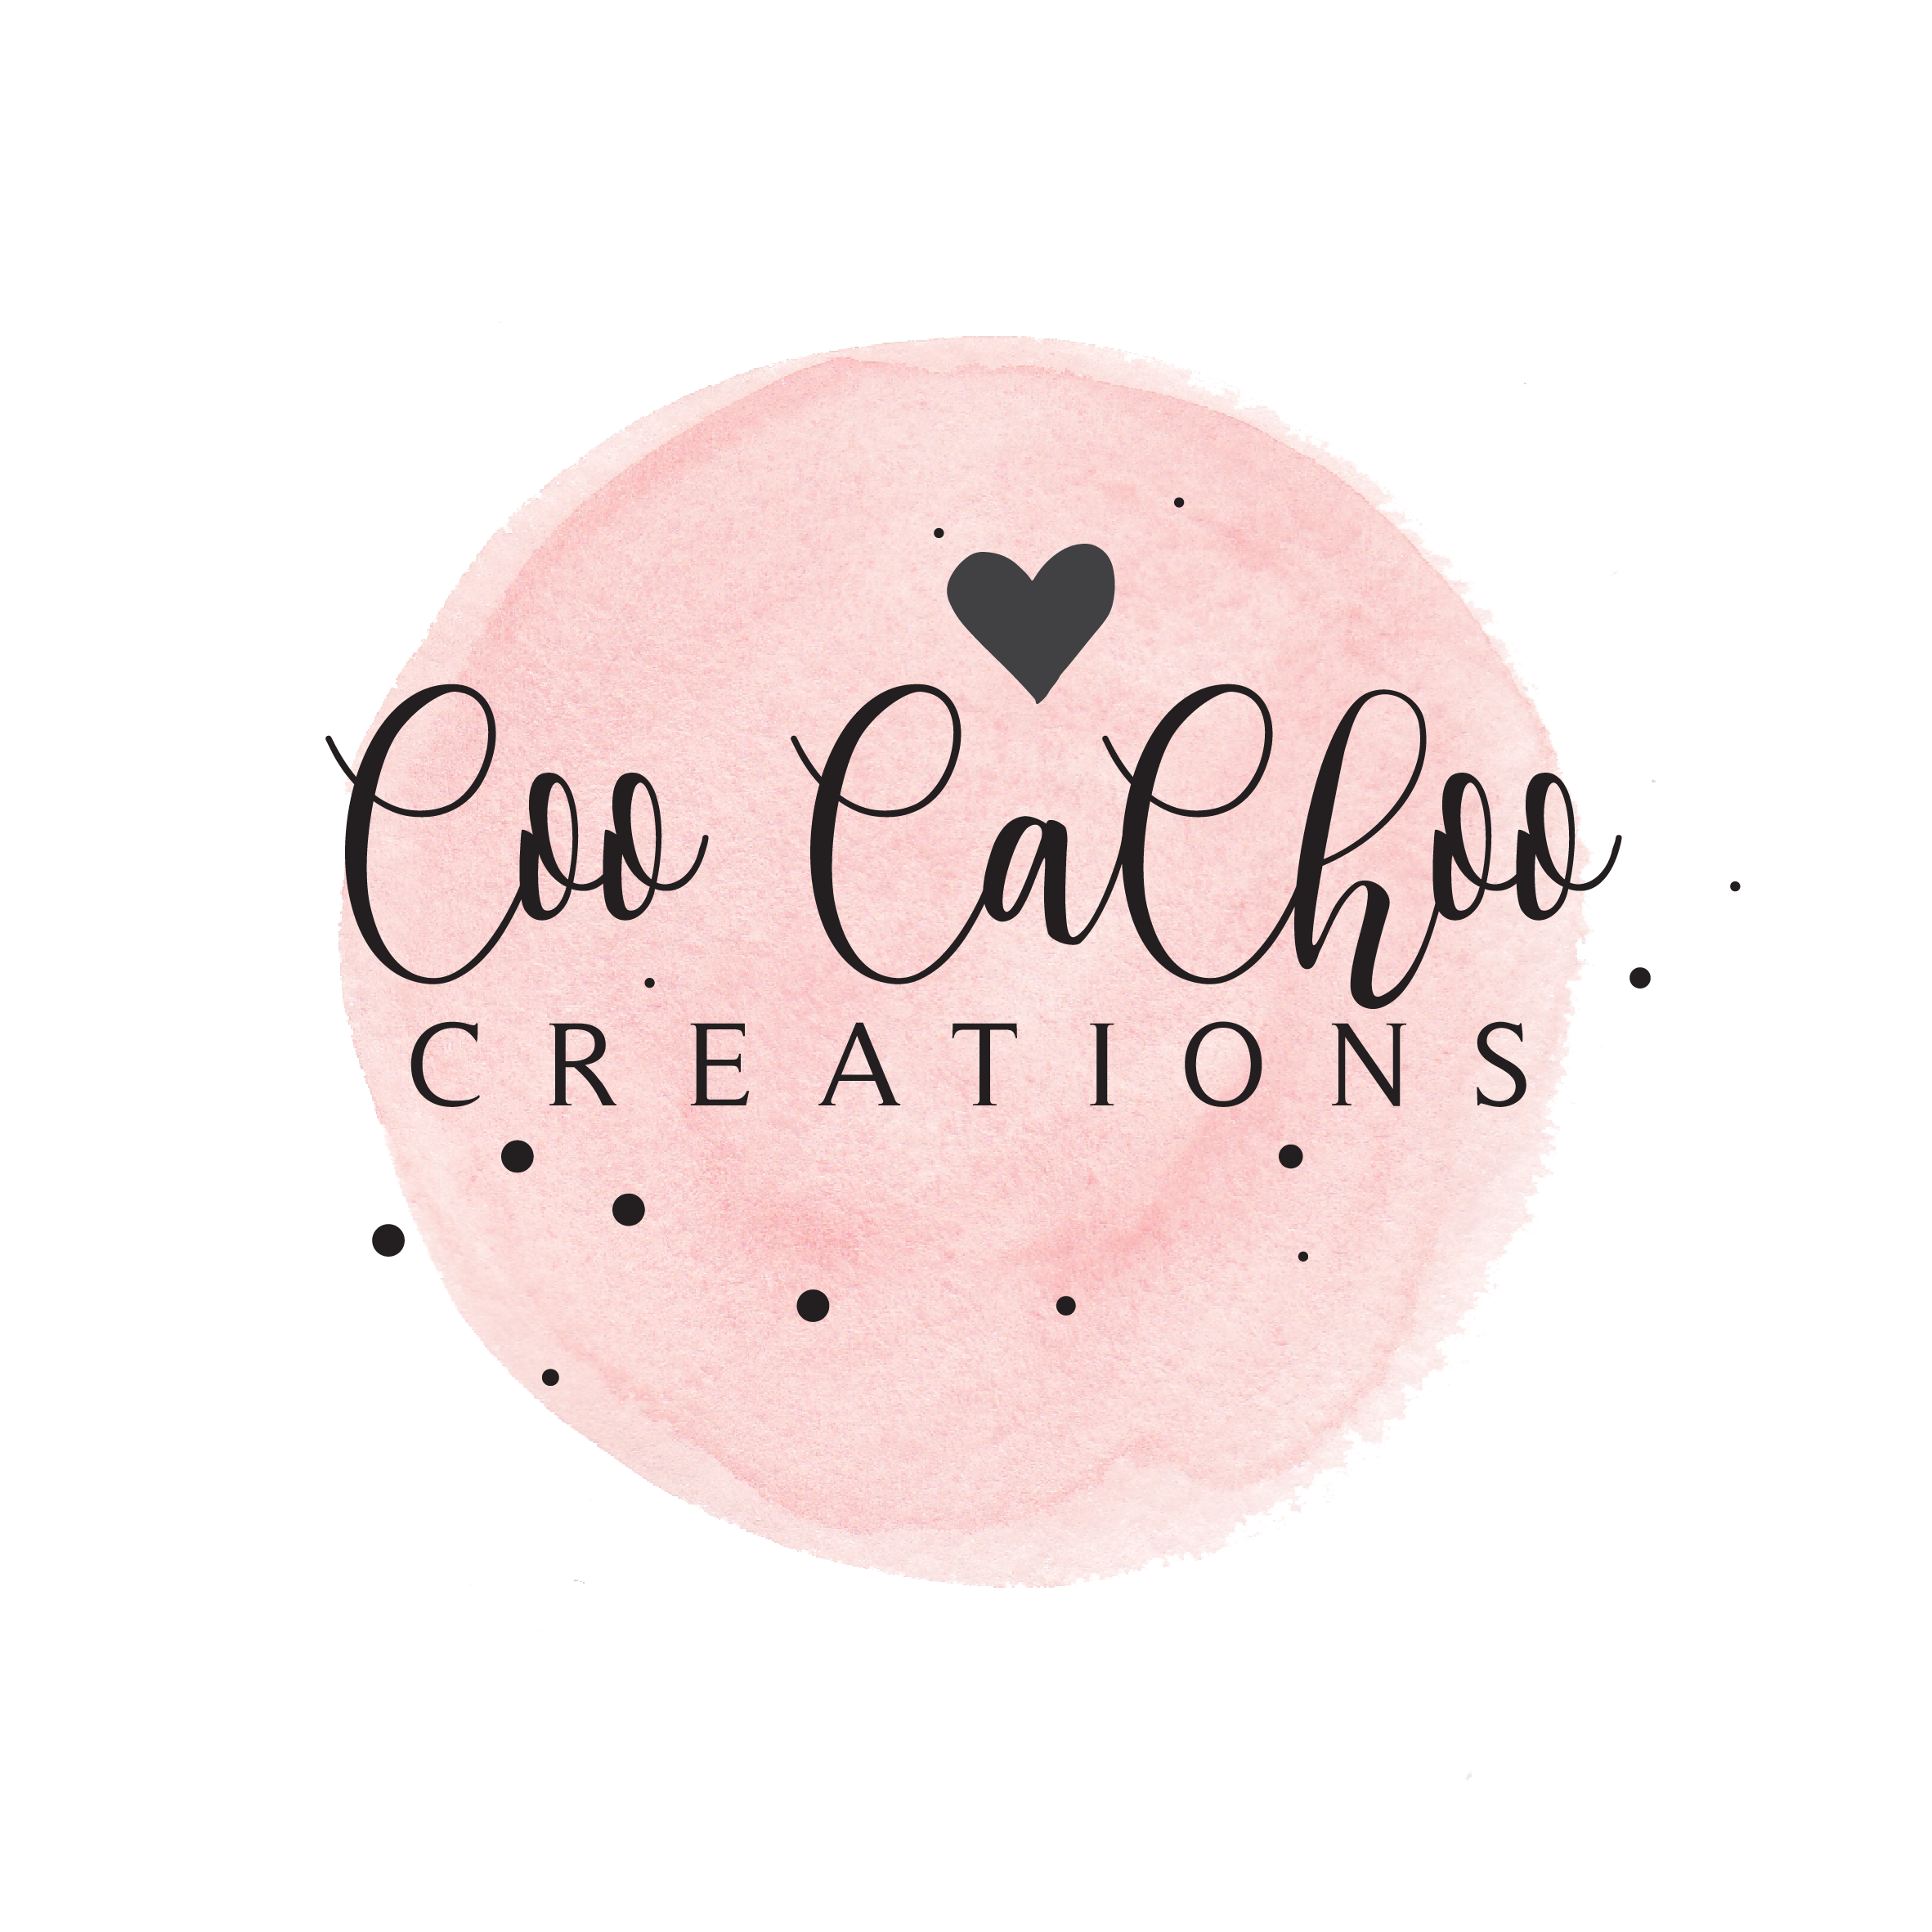 Logocoocachoocreations-01